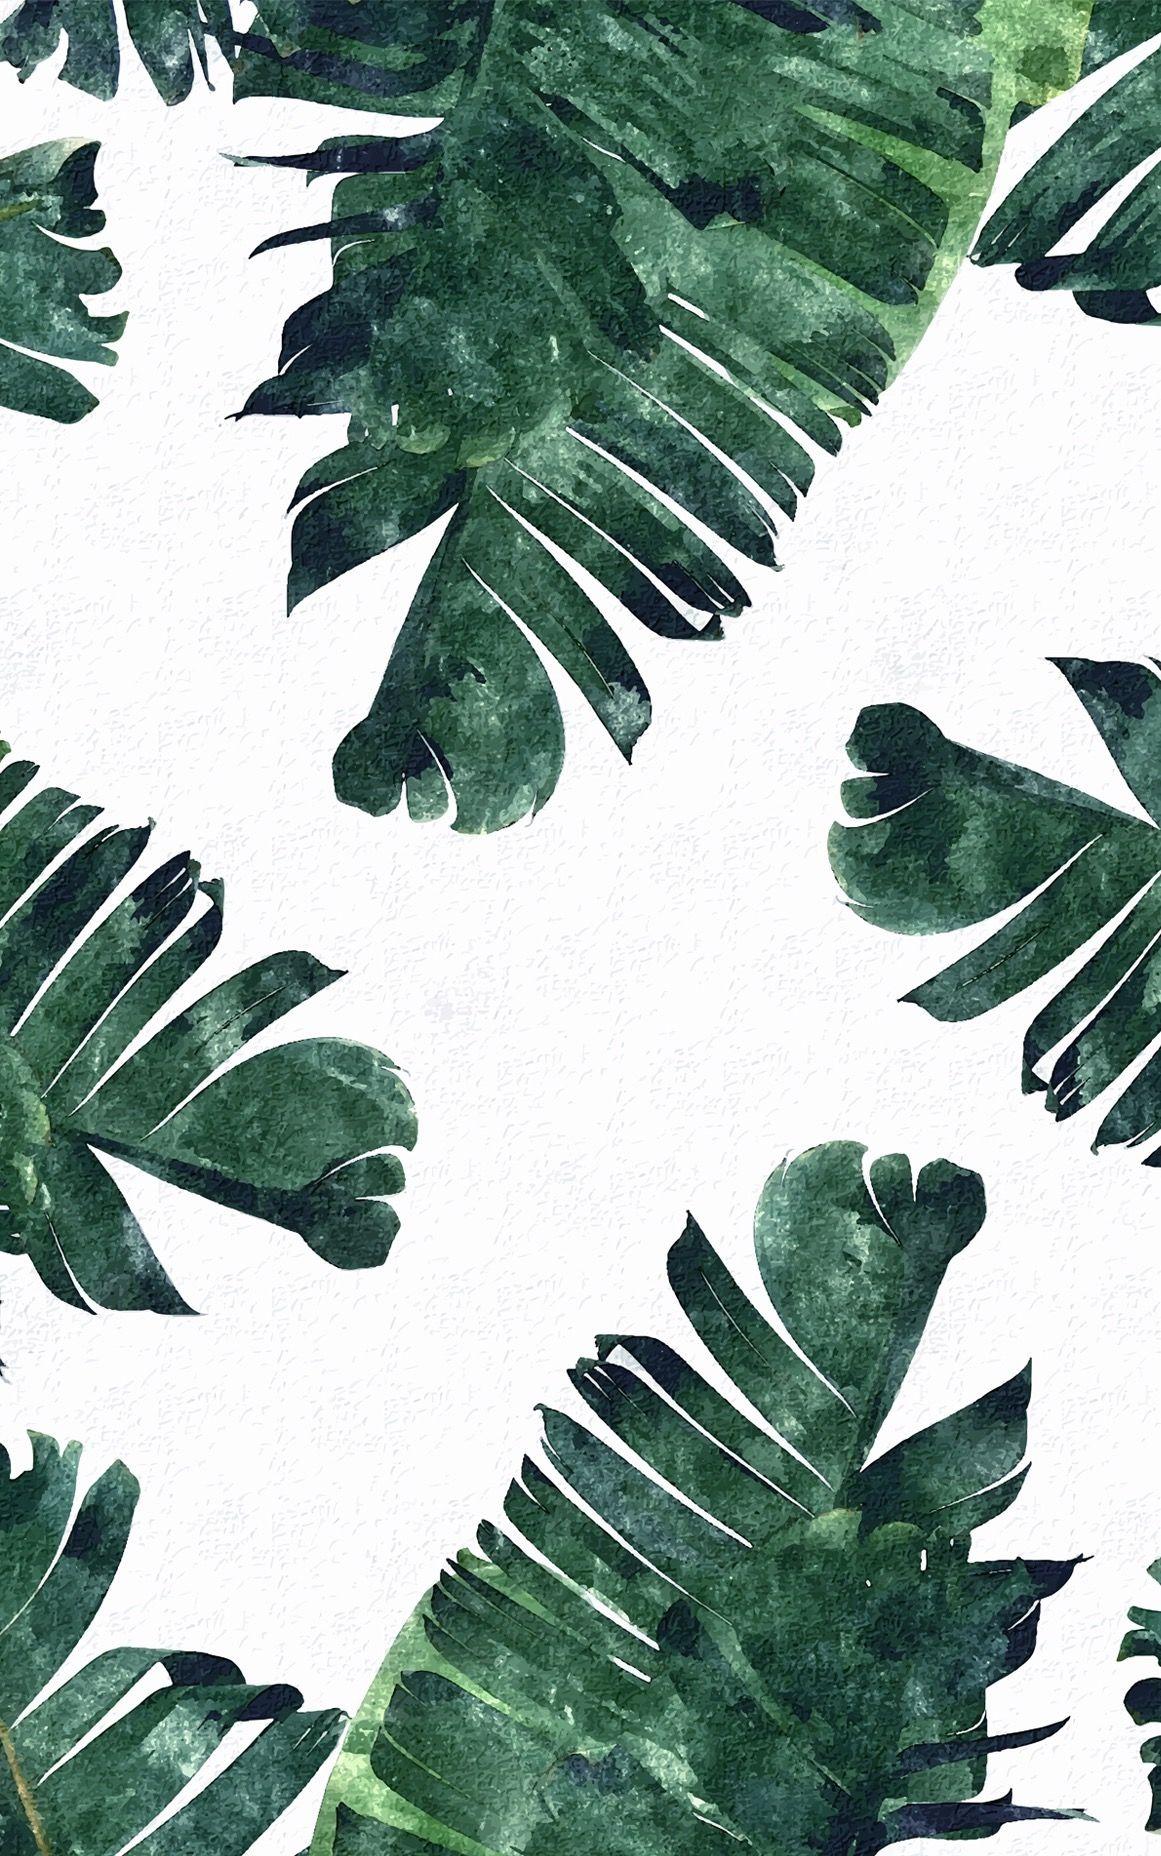 Pin By Savannah On Screenshots Banana Leaves Watercolor Leaf Background Leaf Wallpaper